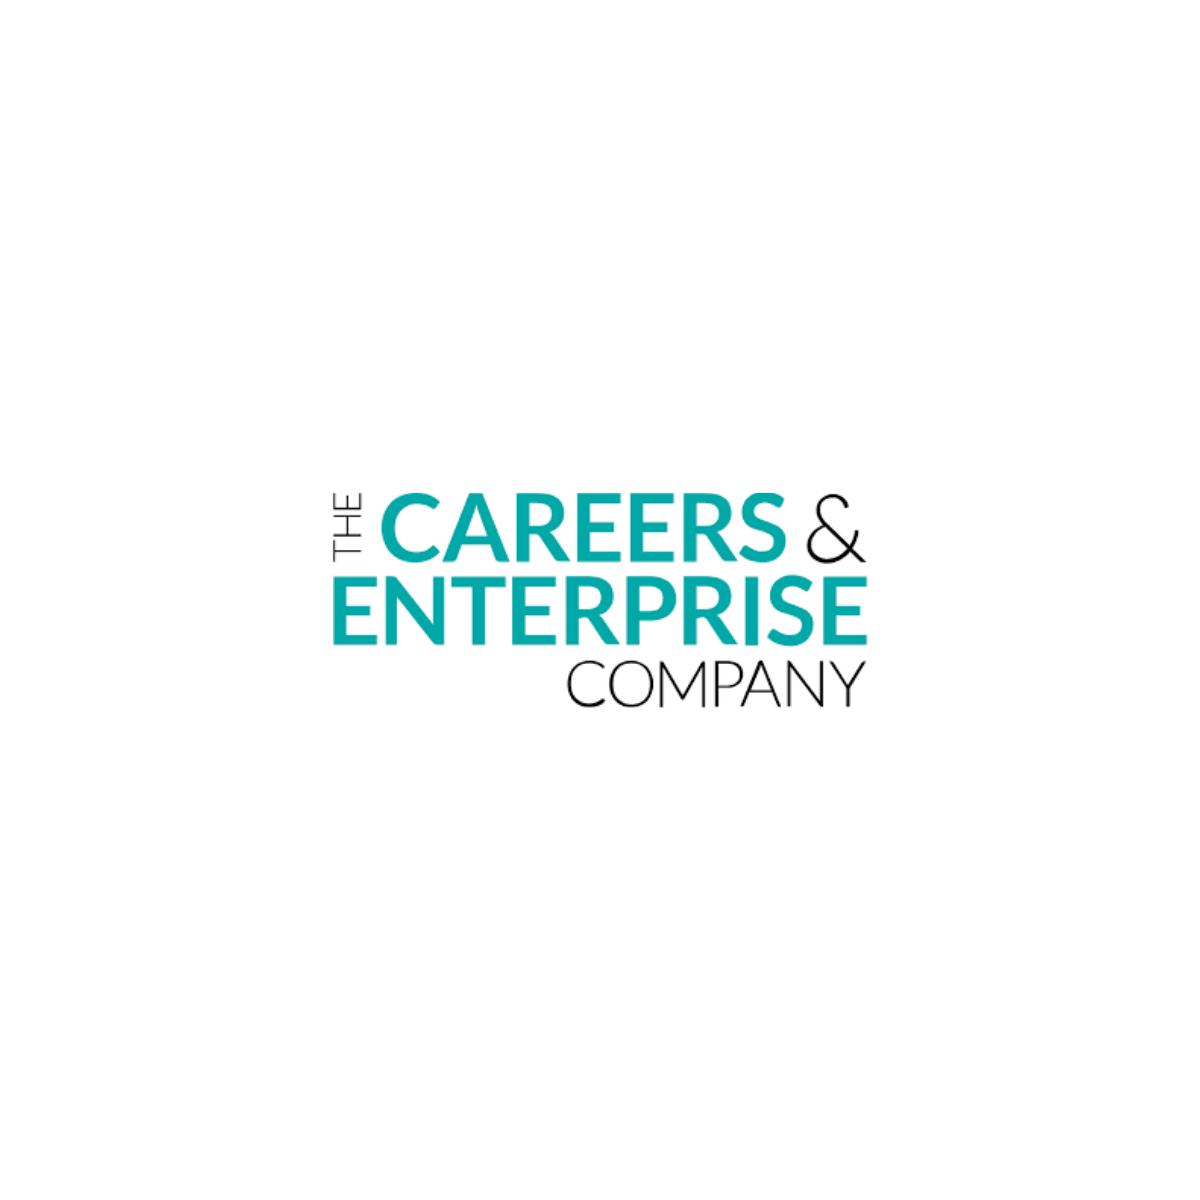 The Careers & Enterprise Company logo